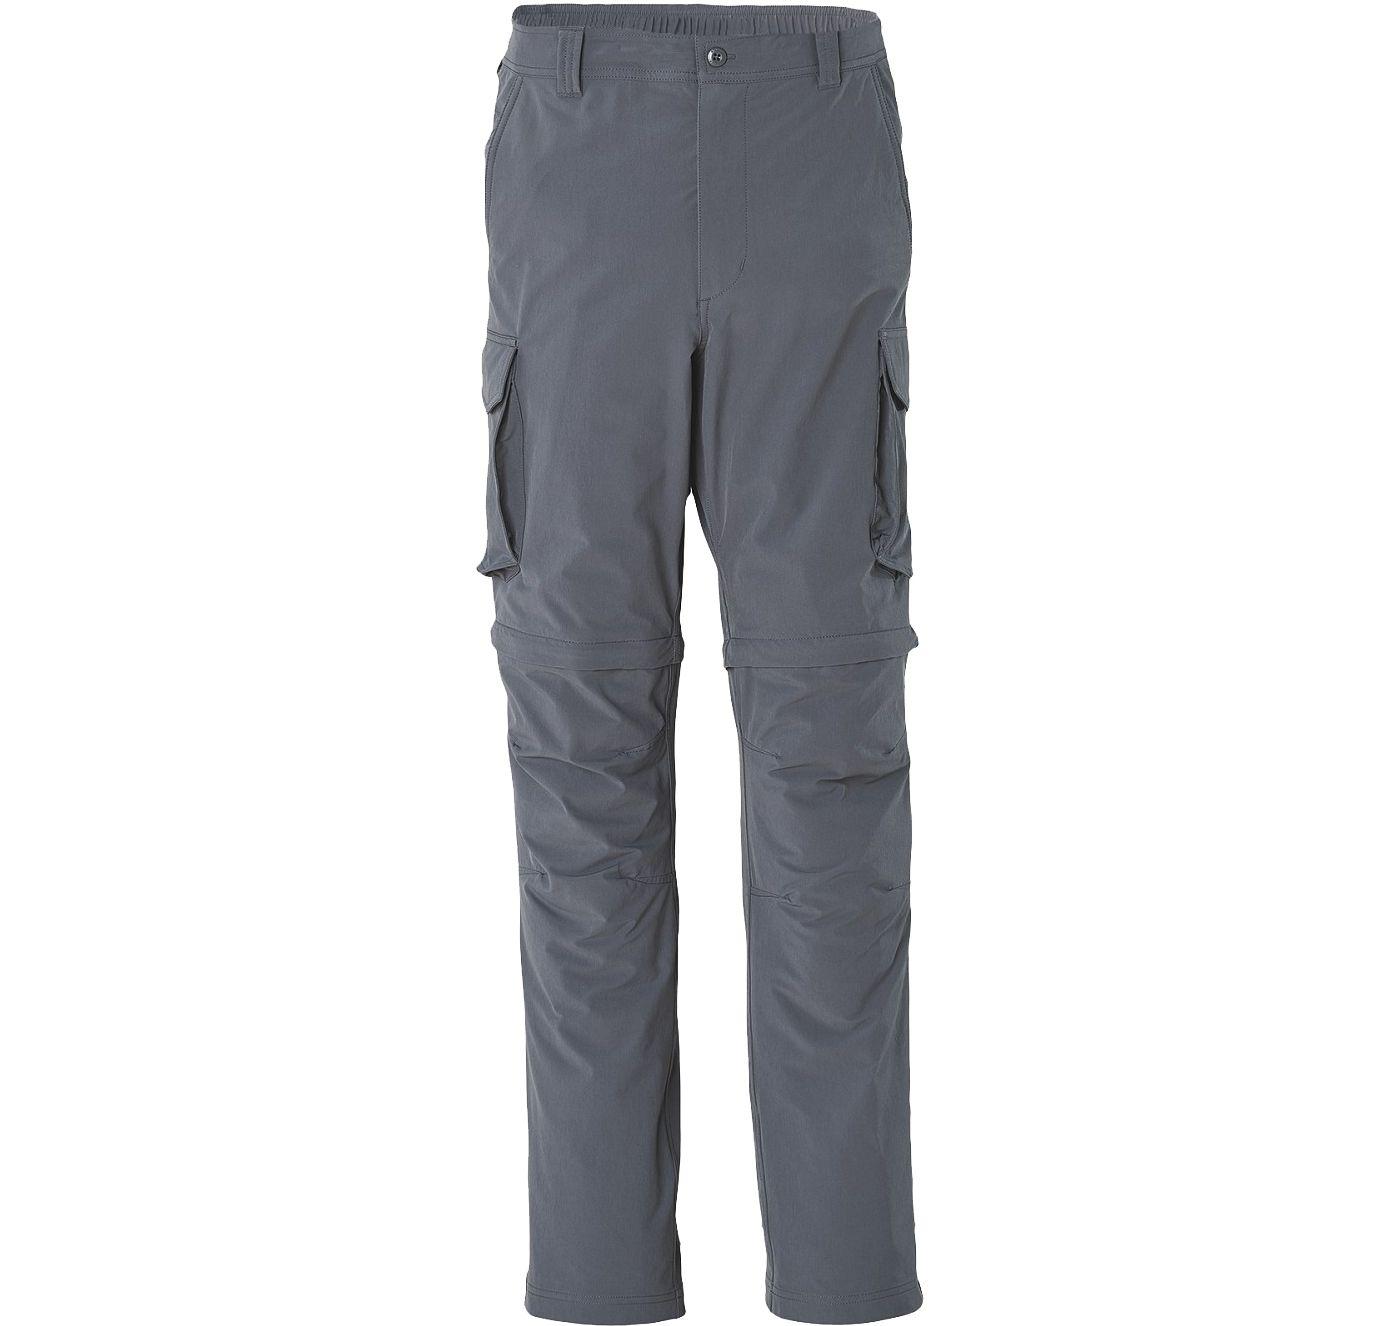 Striker Men's Barrier UPF Zip-Off Pants (Regular and Big & Tall)